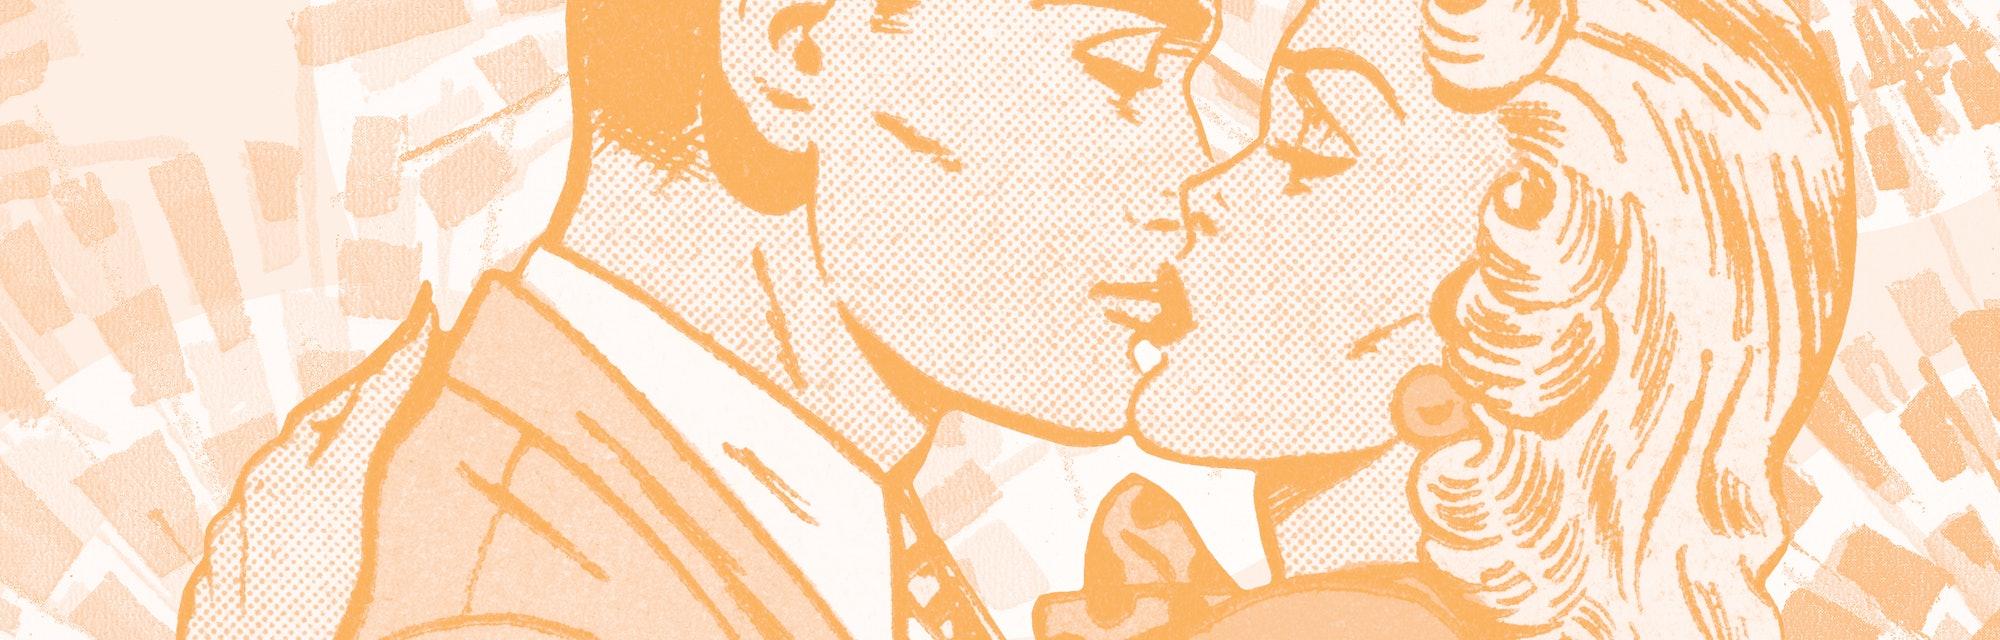 A couple kissing.